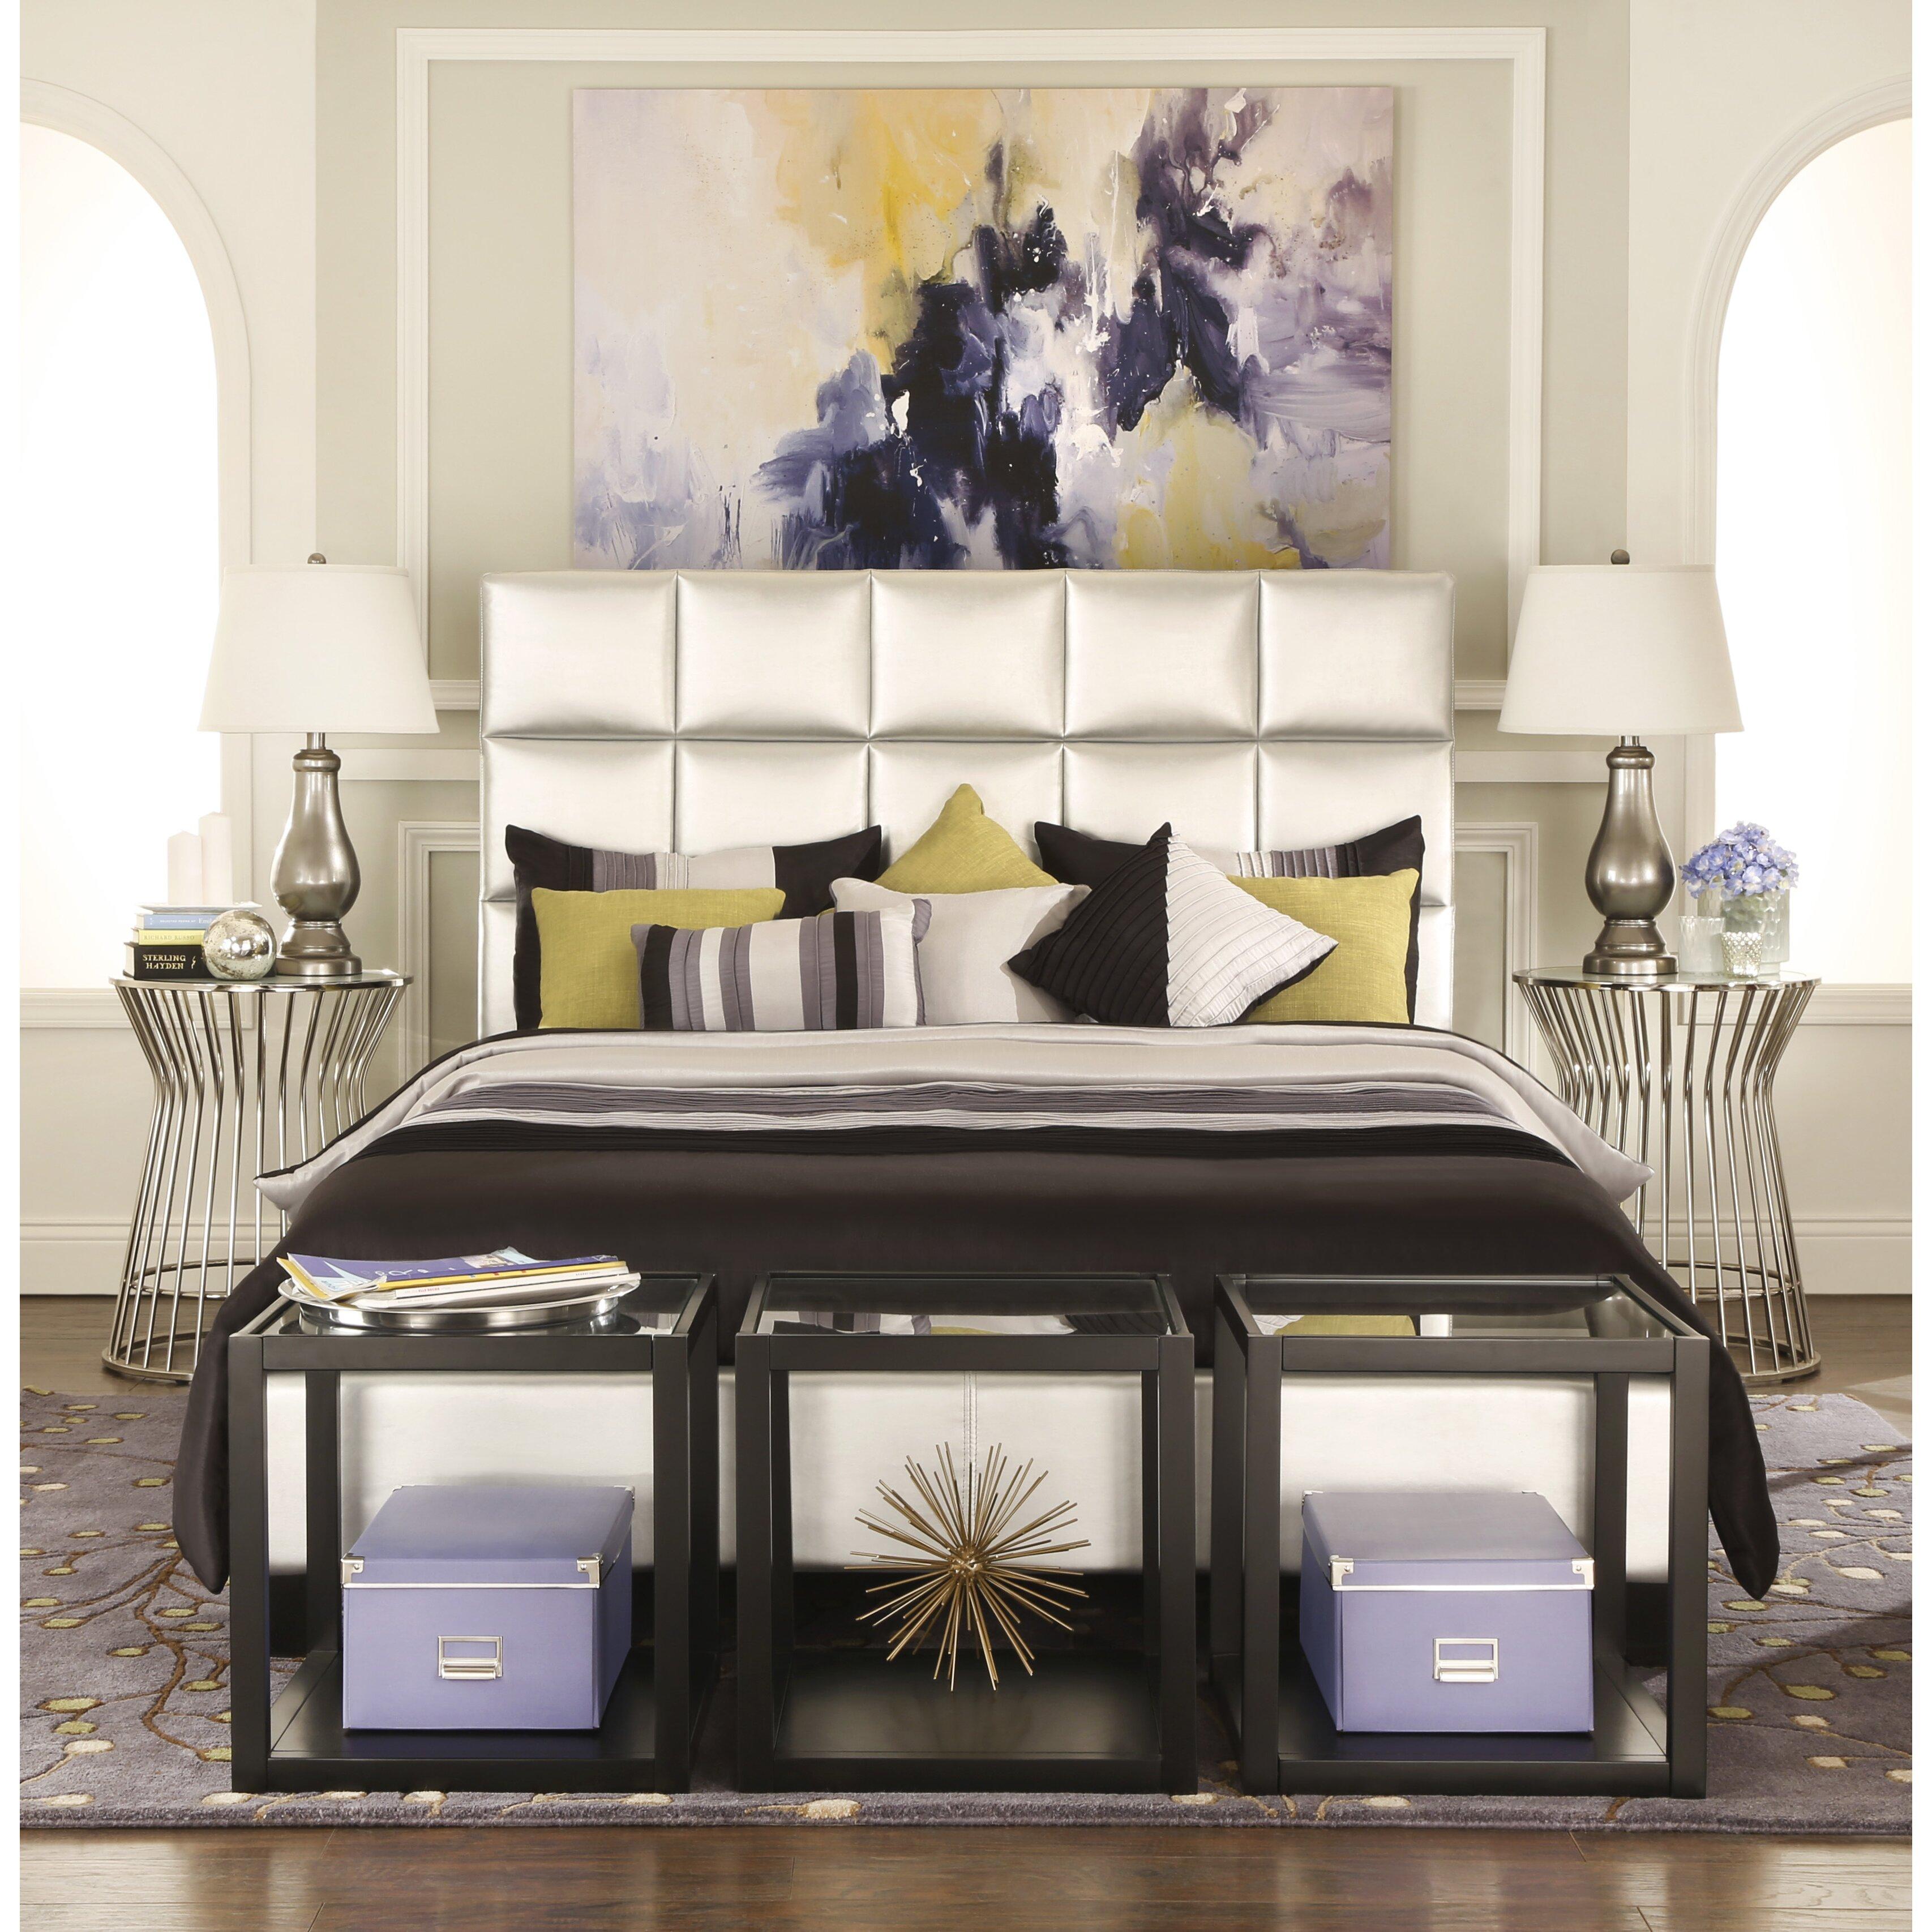 Kingstown Bedroom Furniture Kingstown Home Beds Youll Love Wayfair